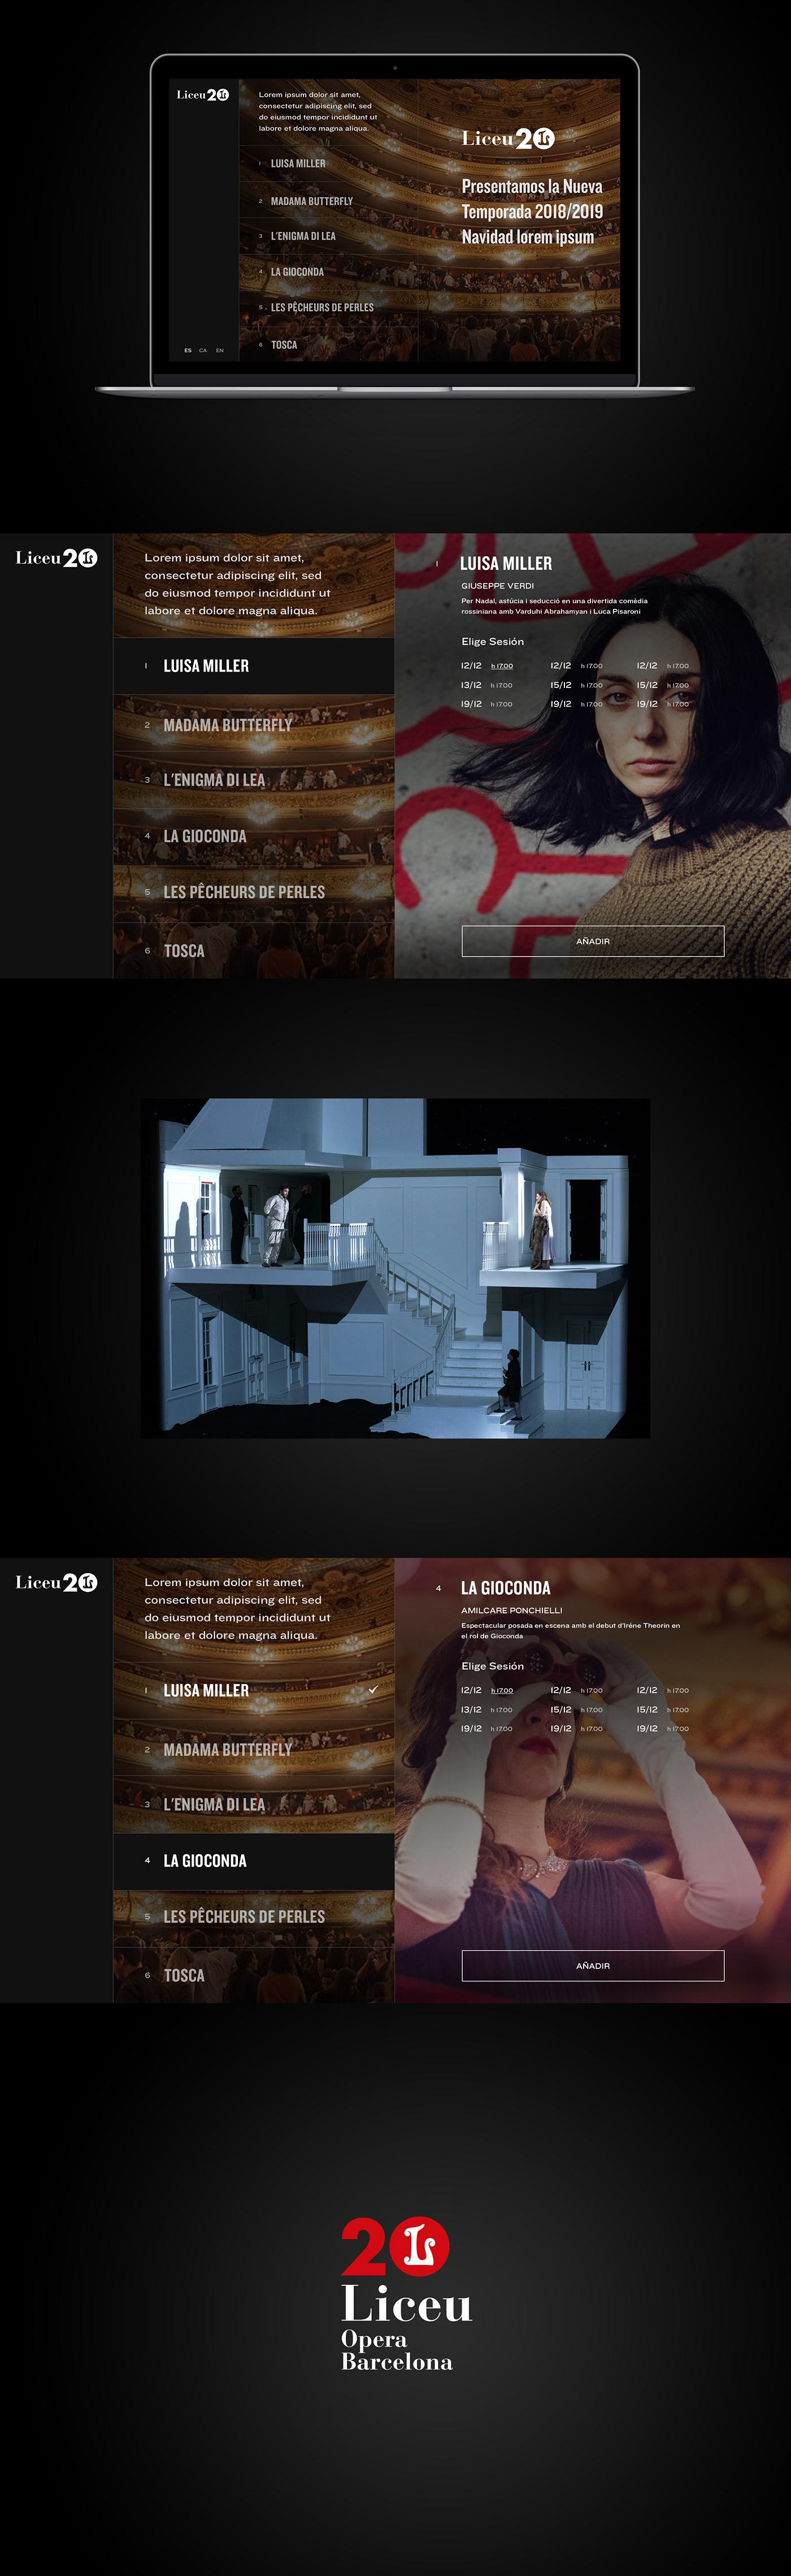 Image may contain: screenshot and house